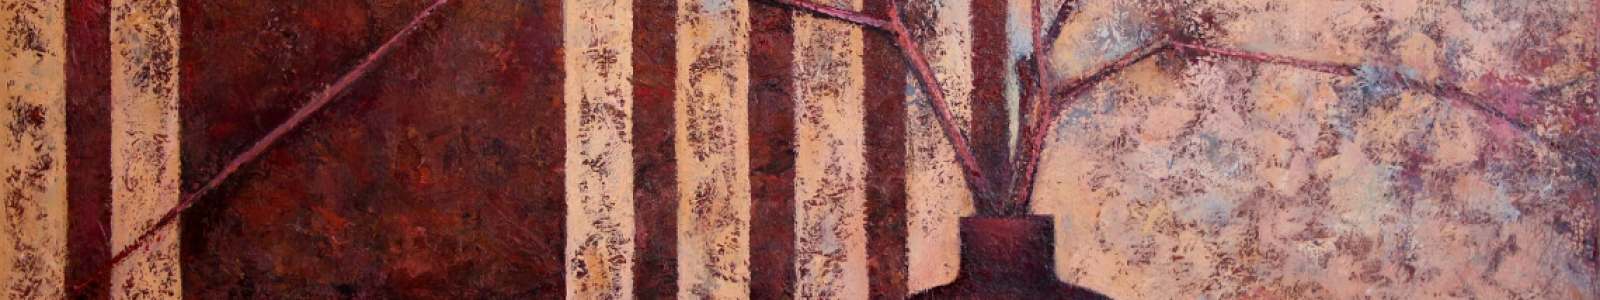 Gallery Painter Rafail Aliyev